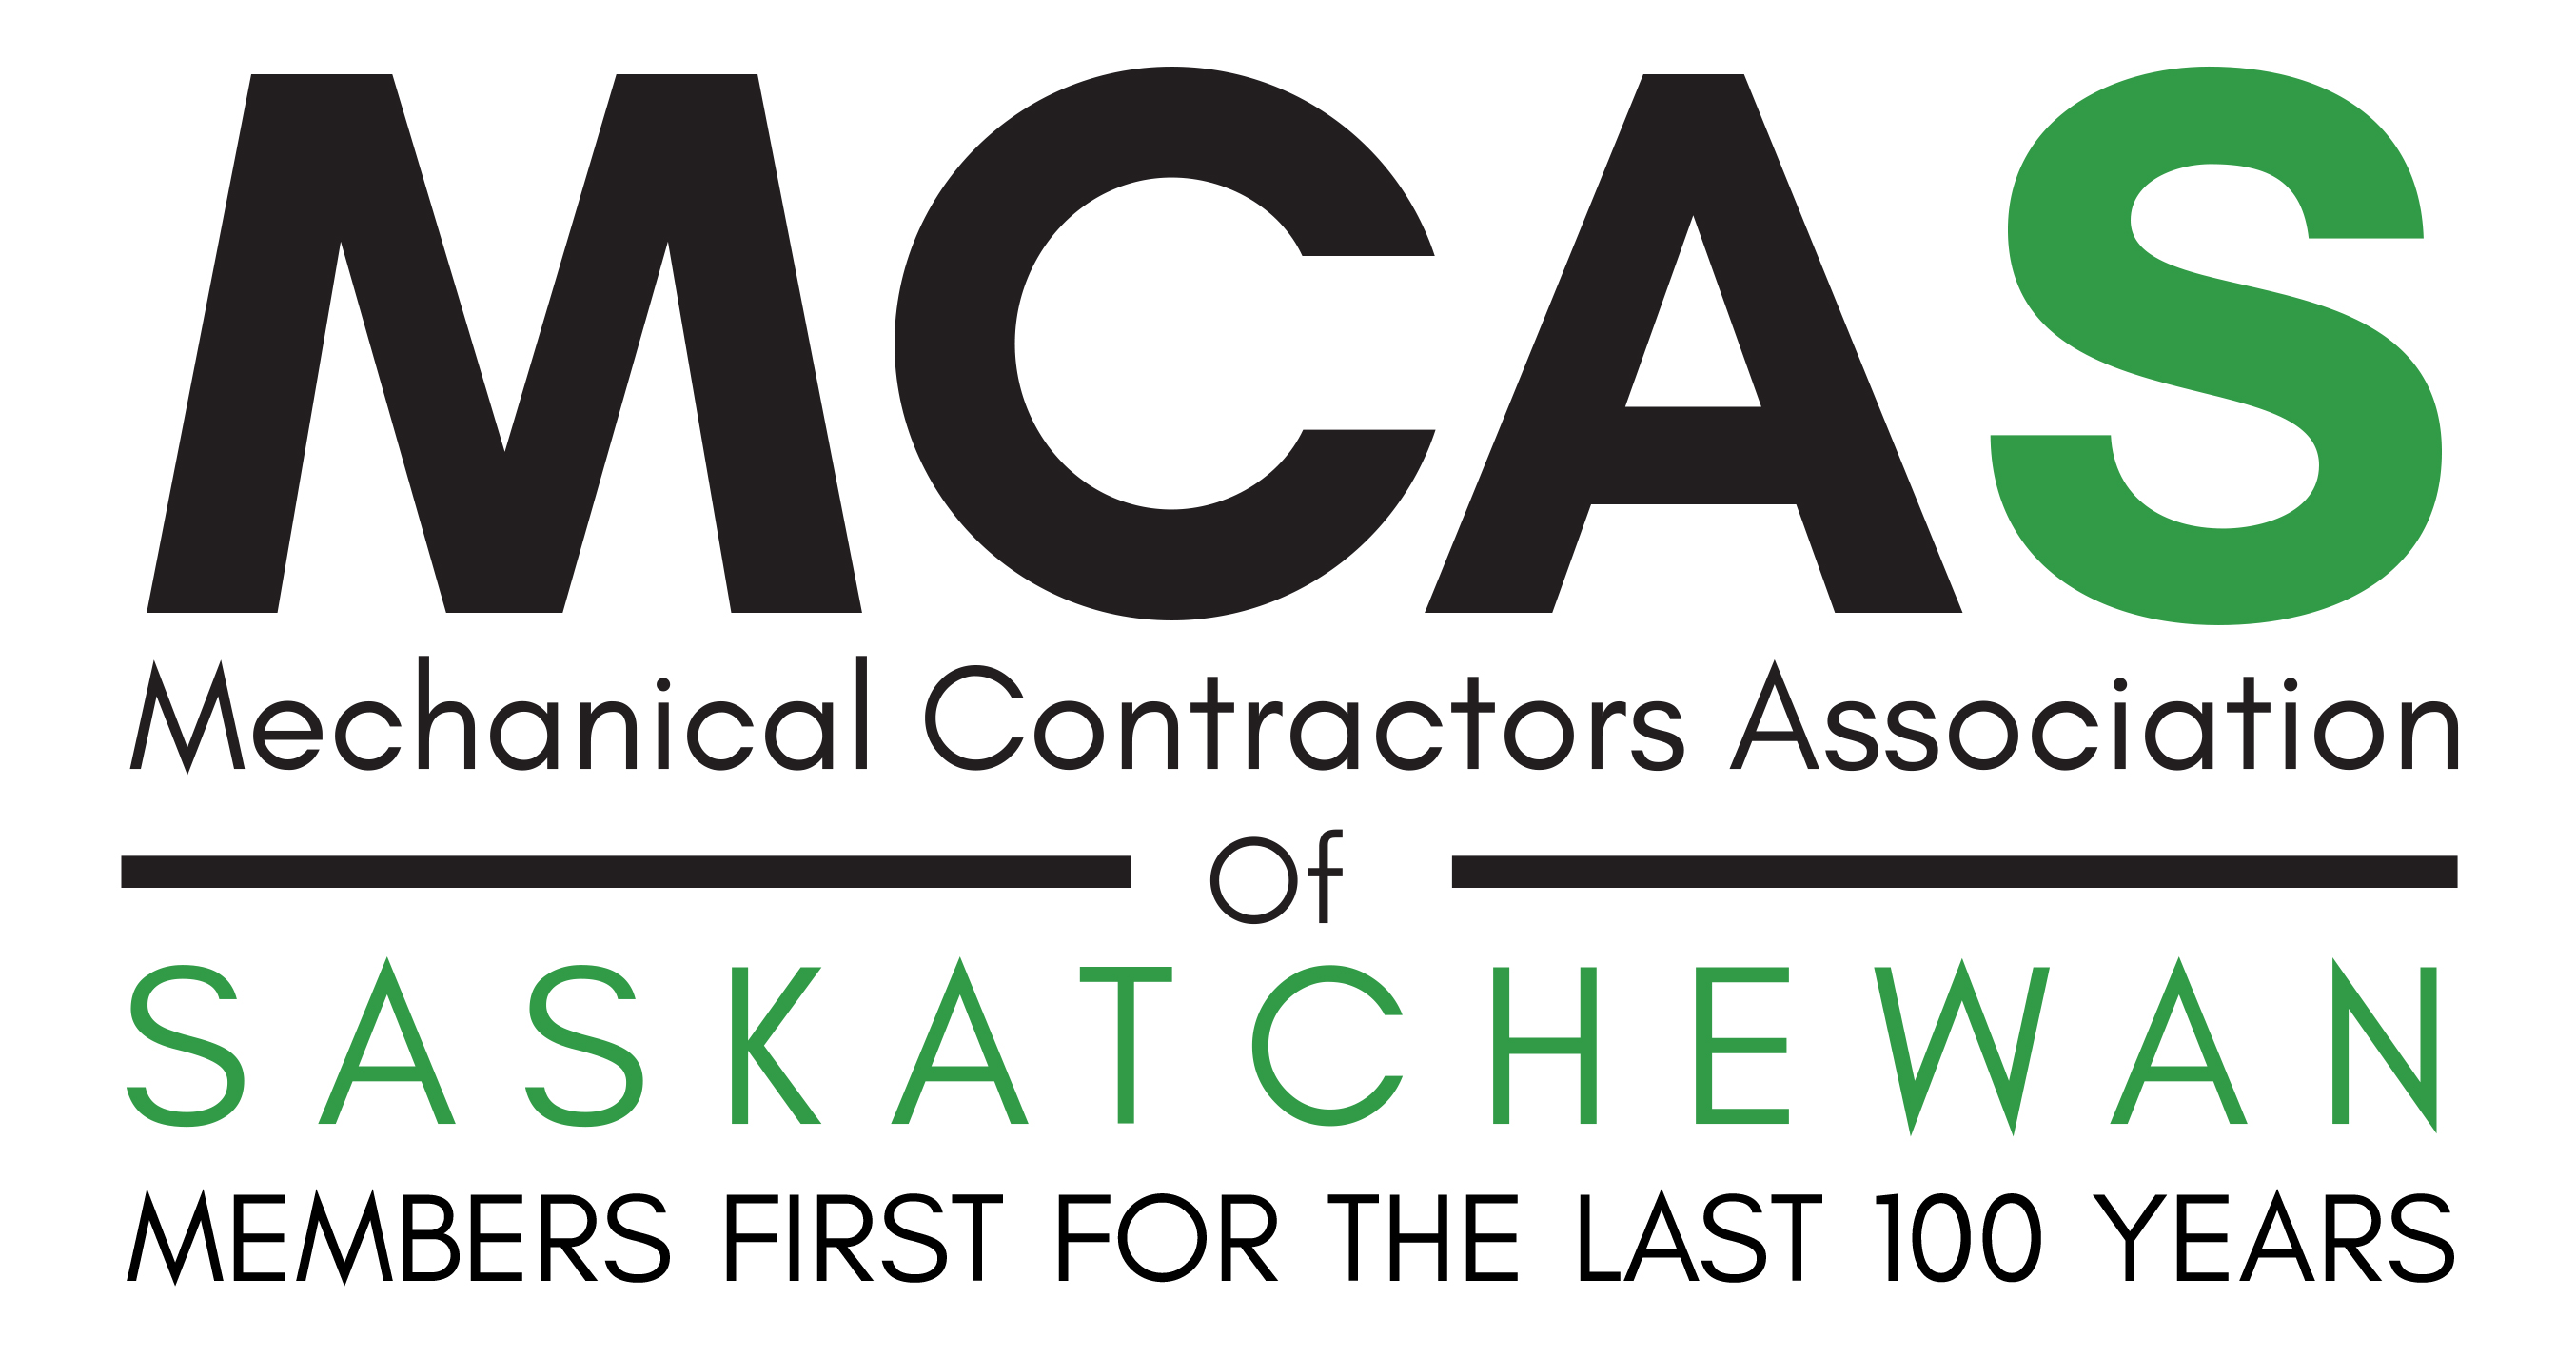 MCAS - Professional